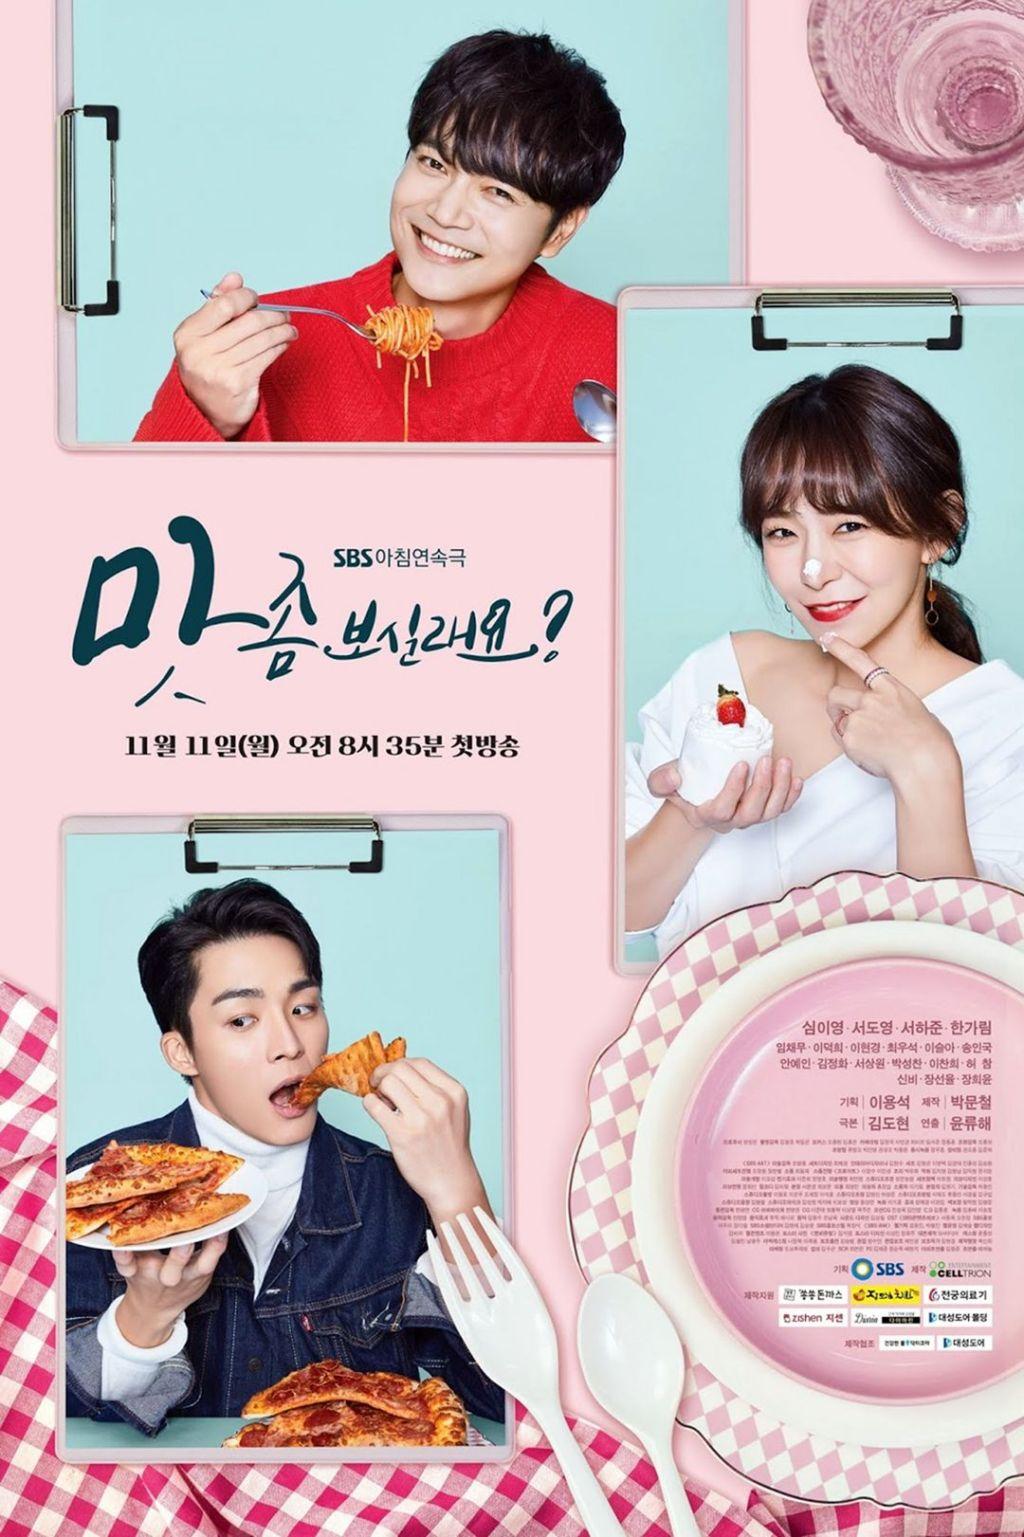 Pemeran K Drama Wanna Taste